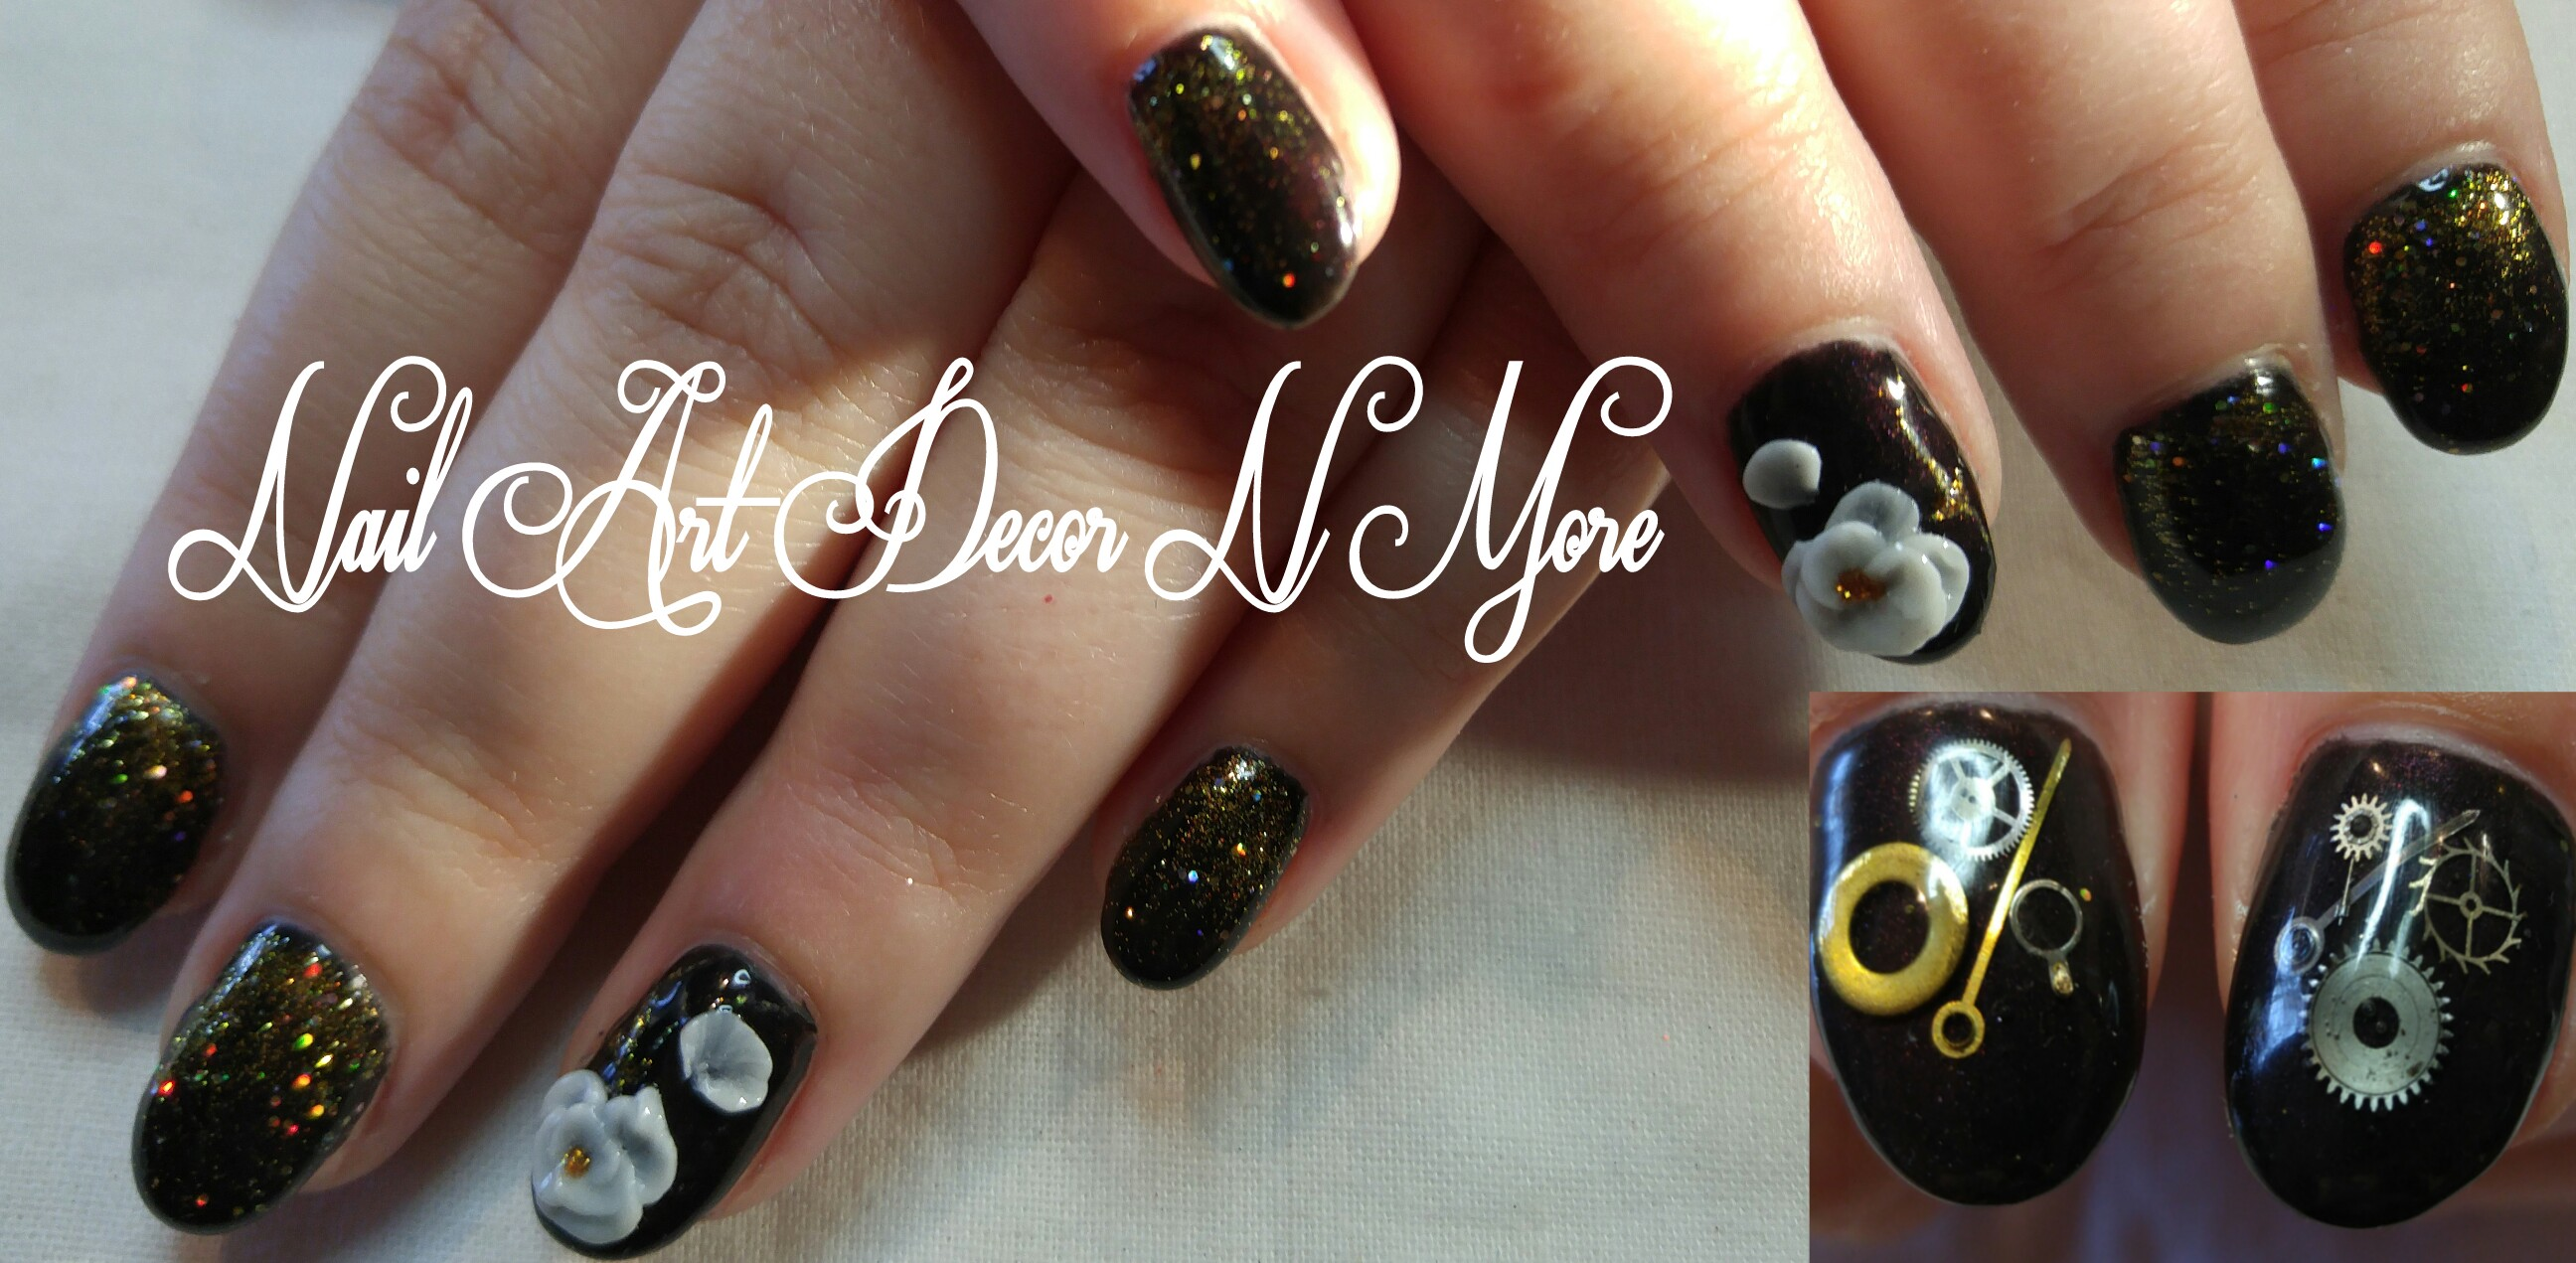 Nail Art Decor N More - Let me pamper you!